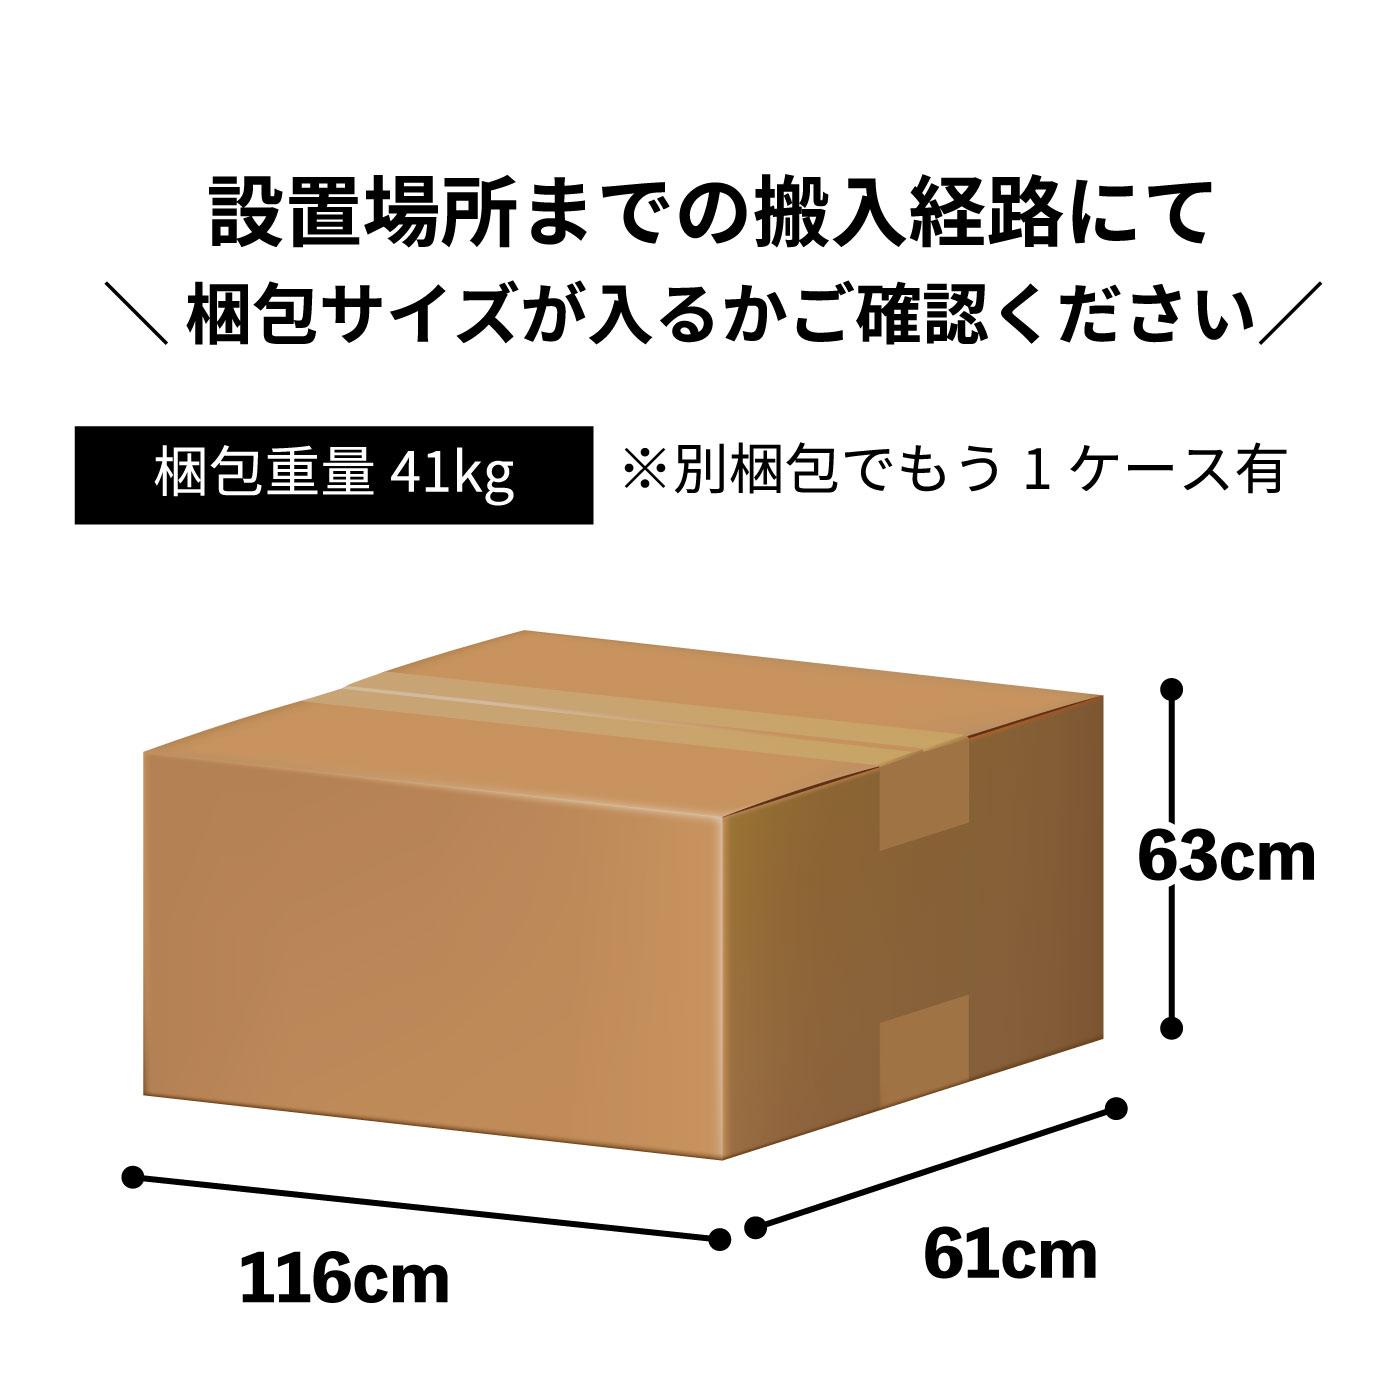 DK-1207の梱包サイズ